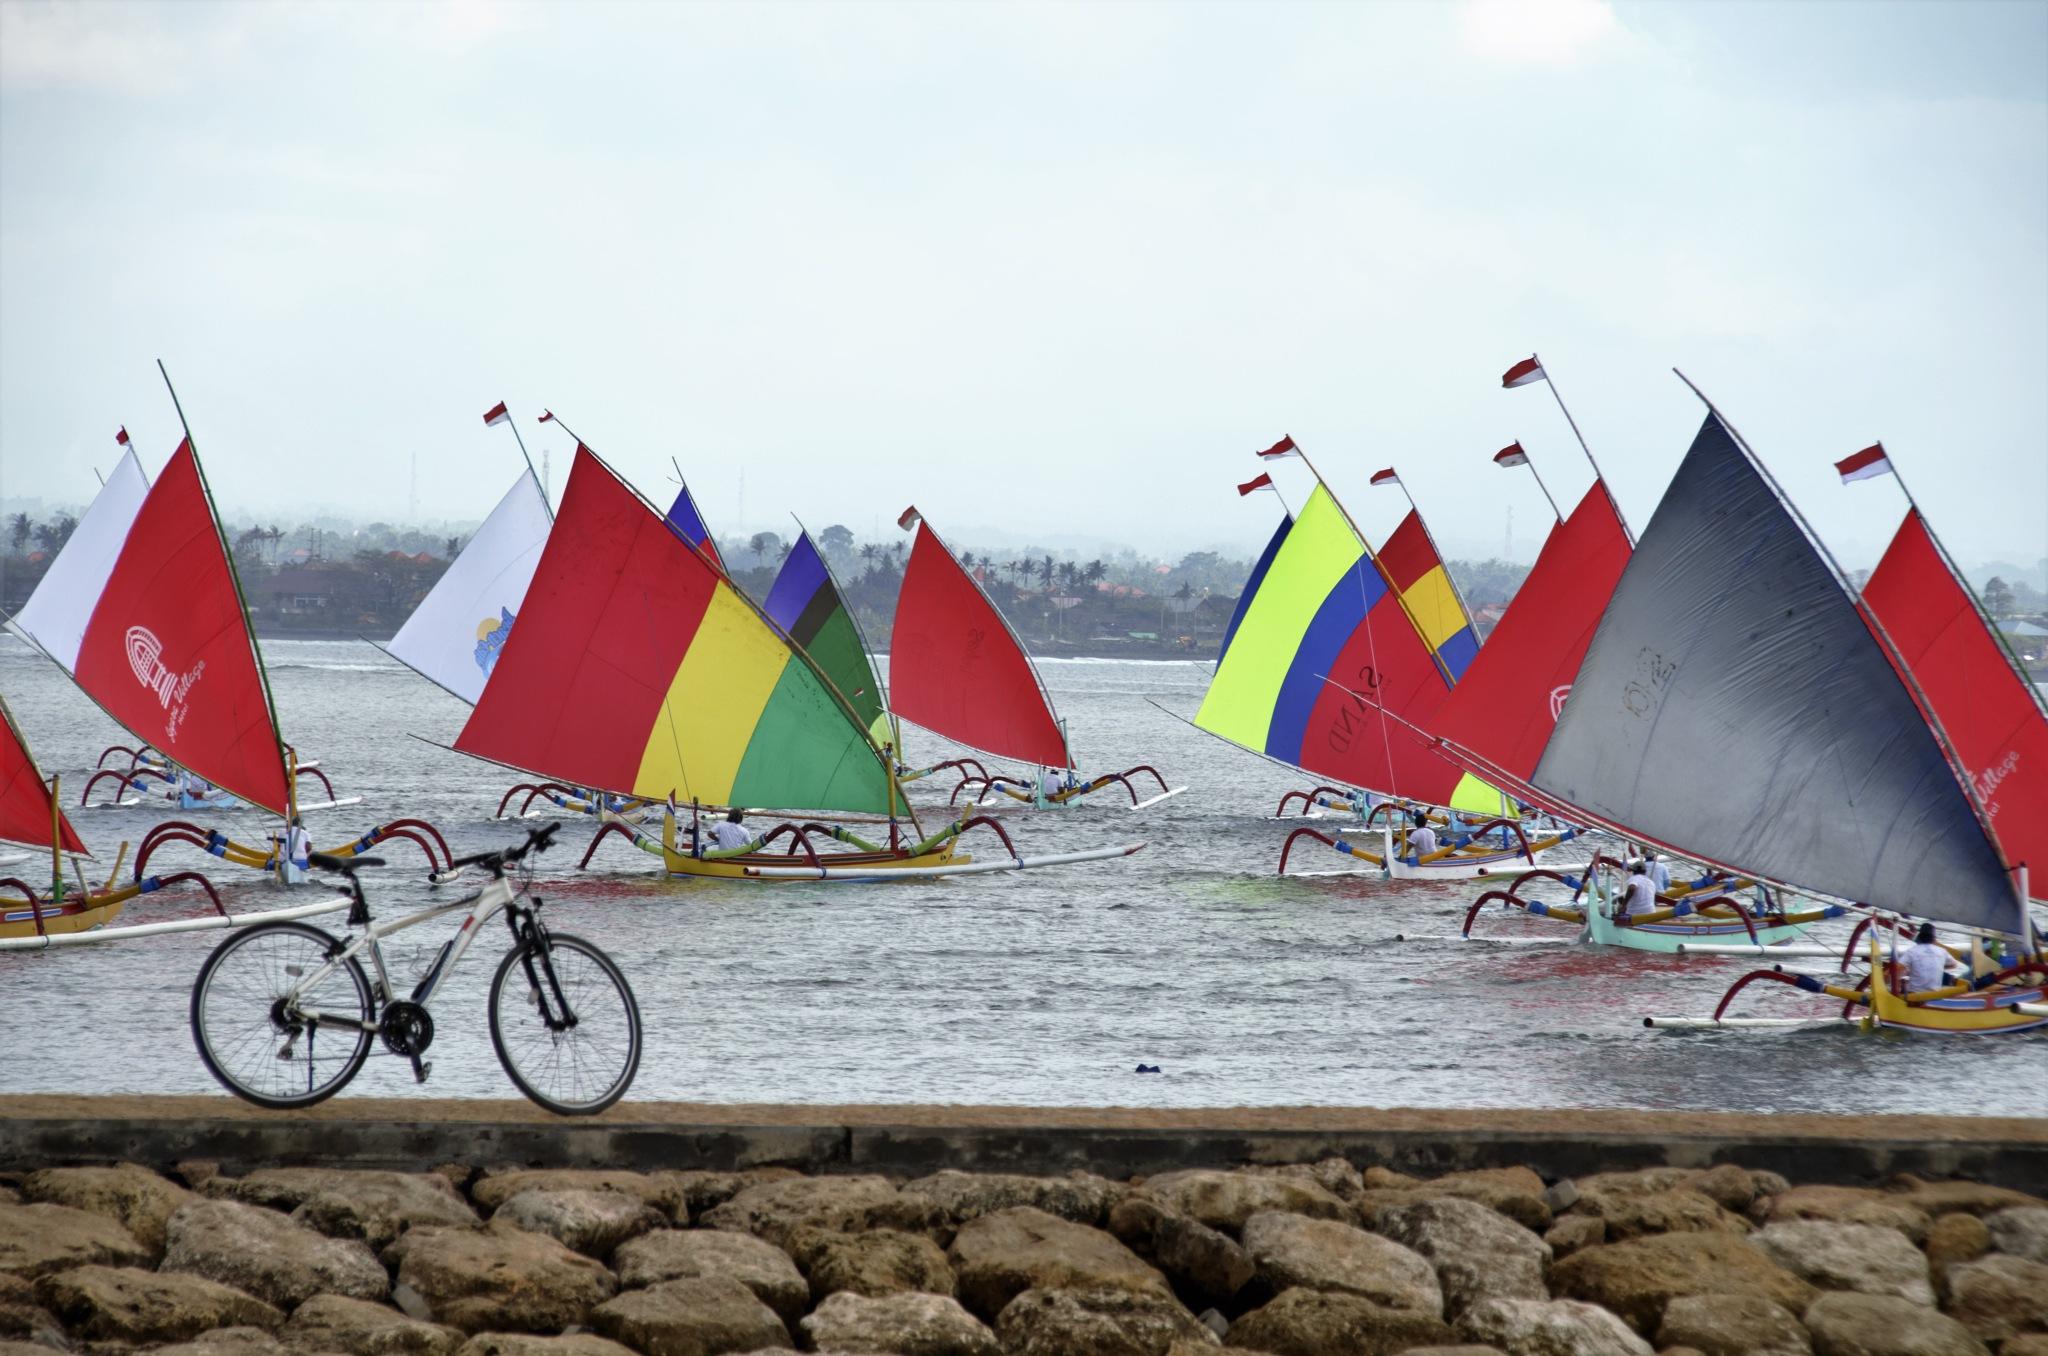 Sepeda dan Jukung by arthamade